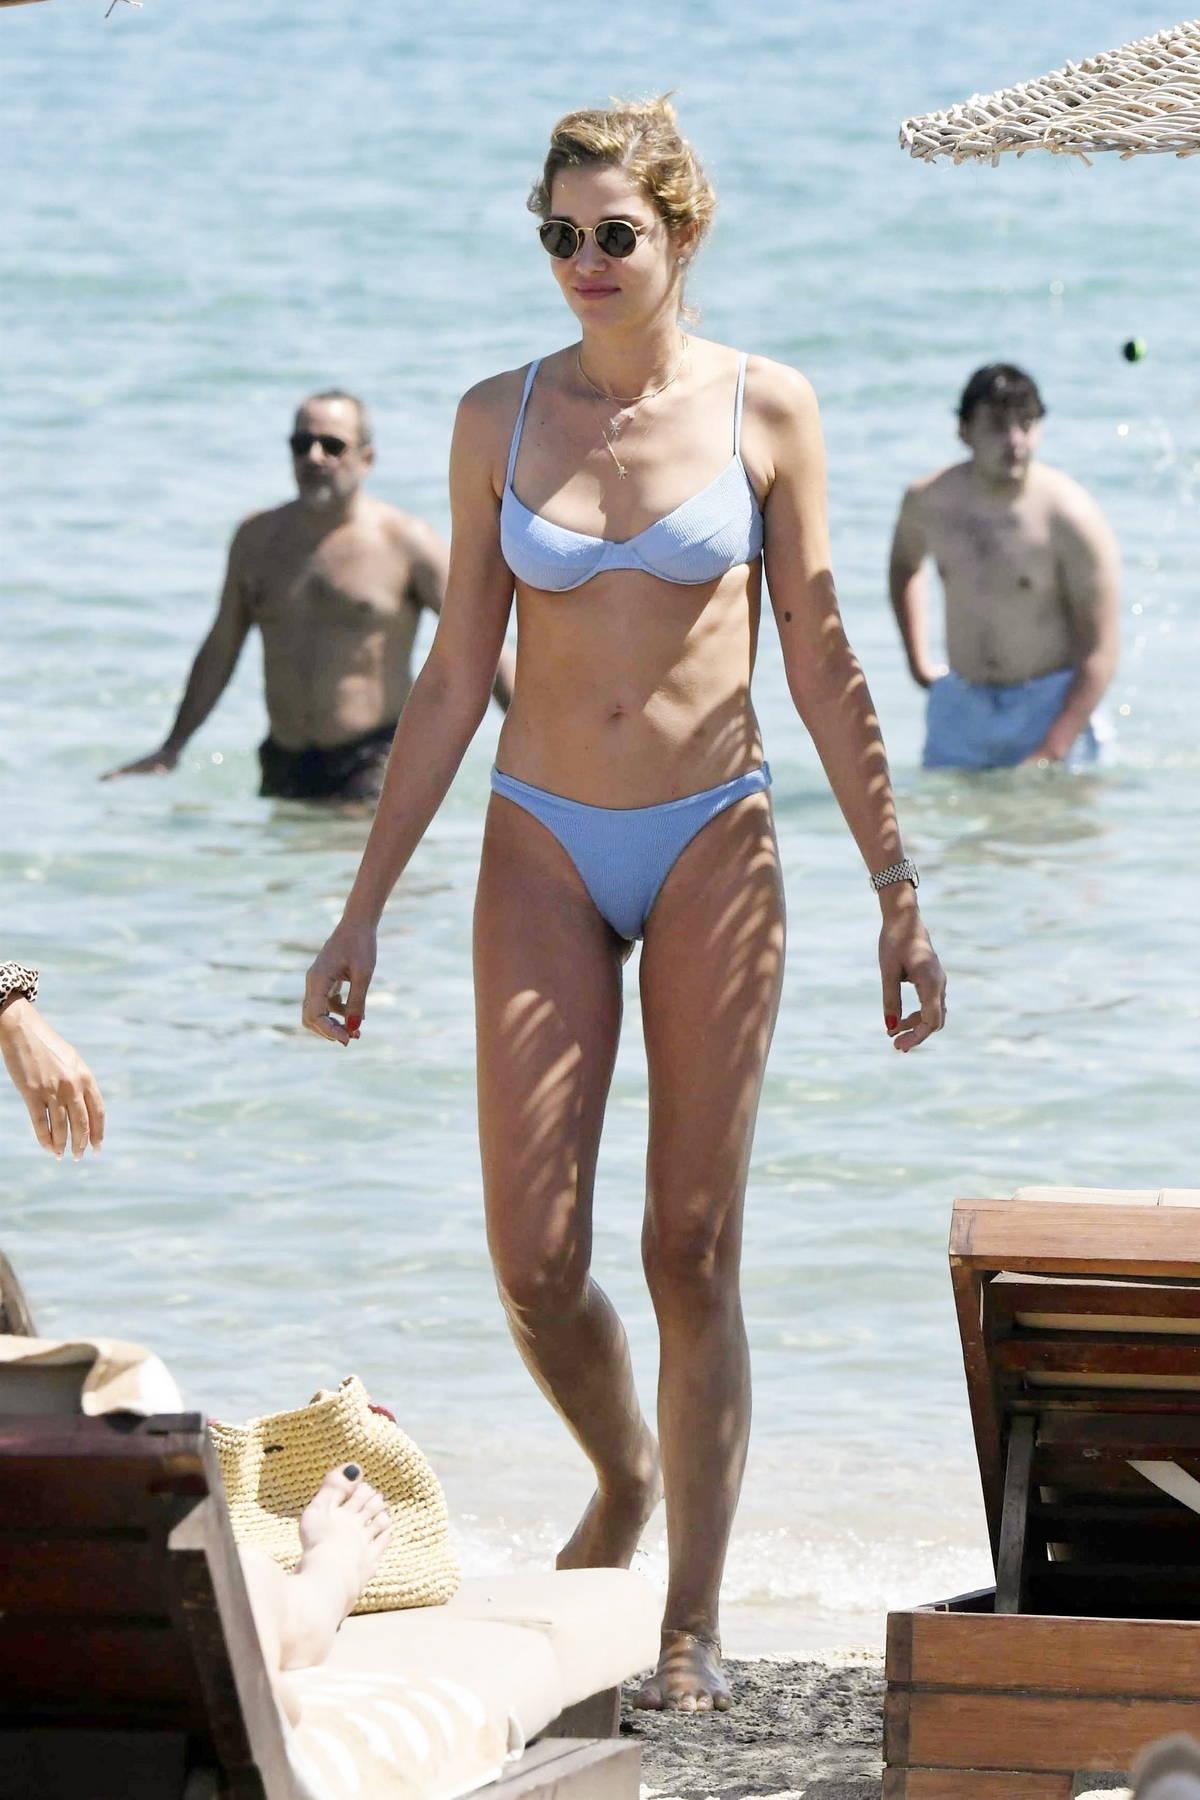 Ana Beatriz Barros slips into a light blue bikini as she enjoys the beach while on holiday in Mykonos, Greece